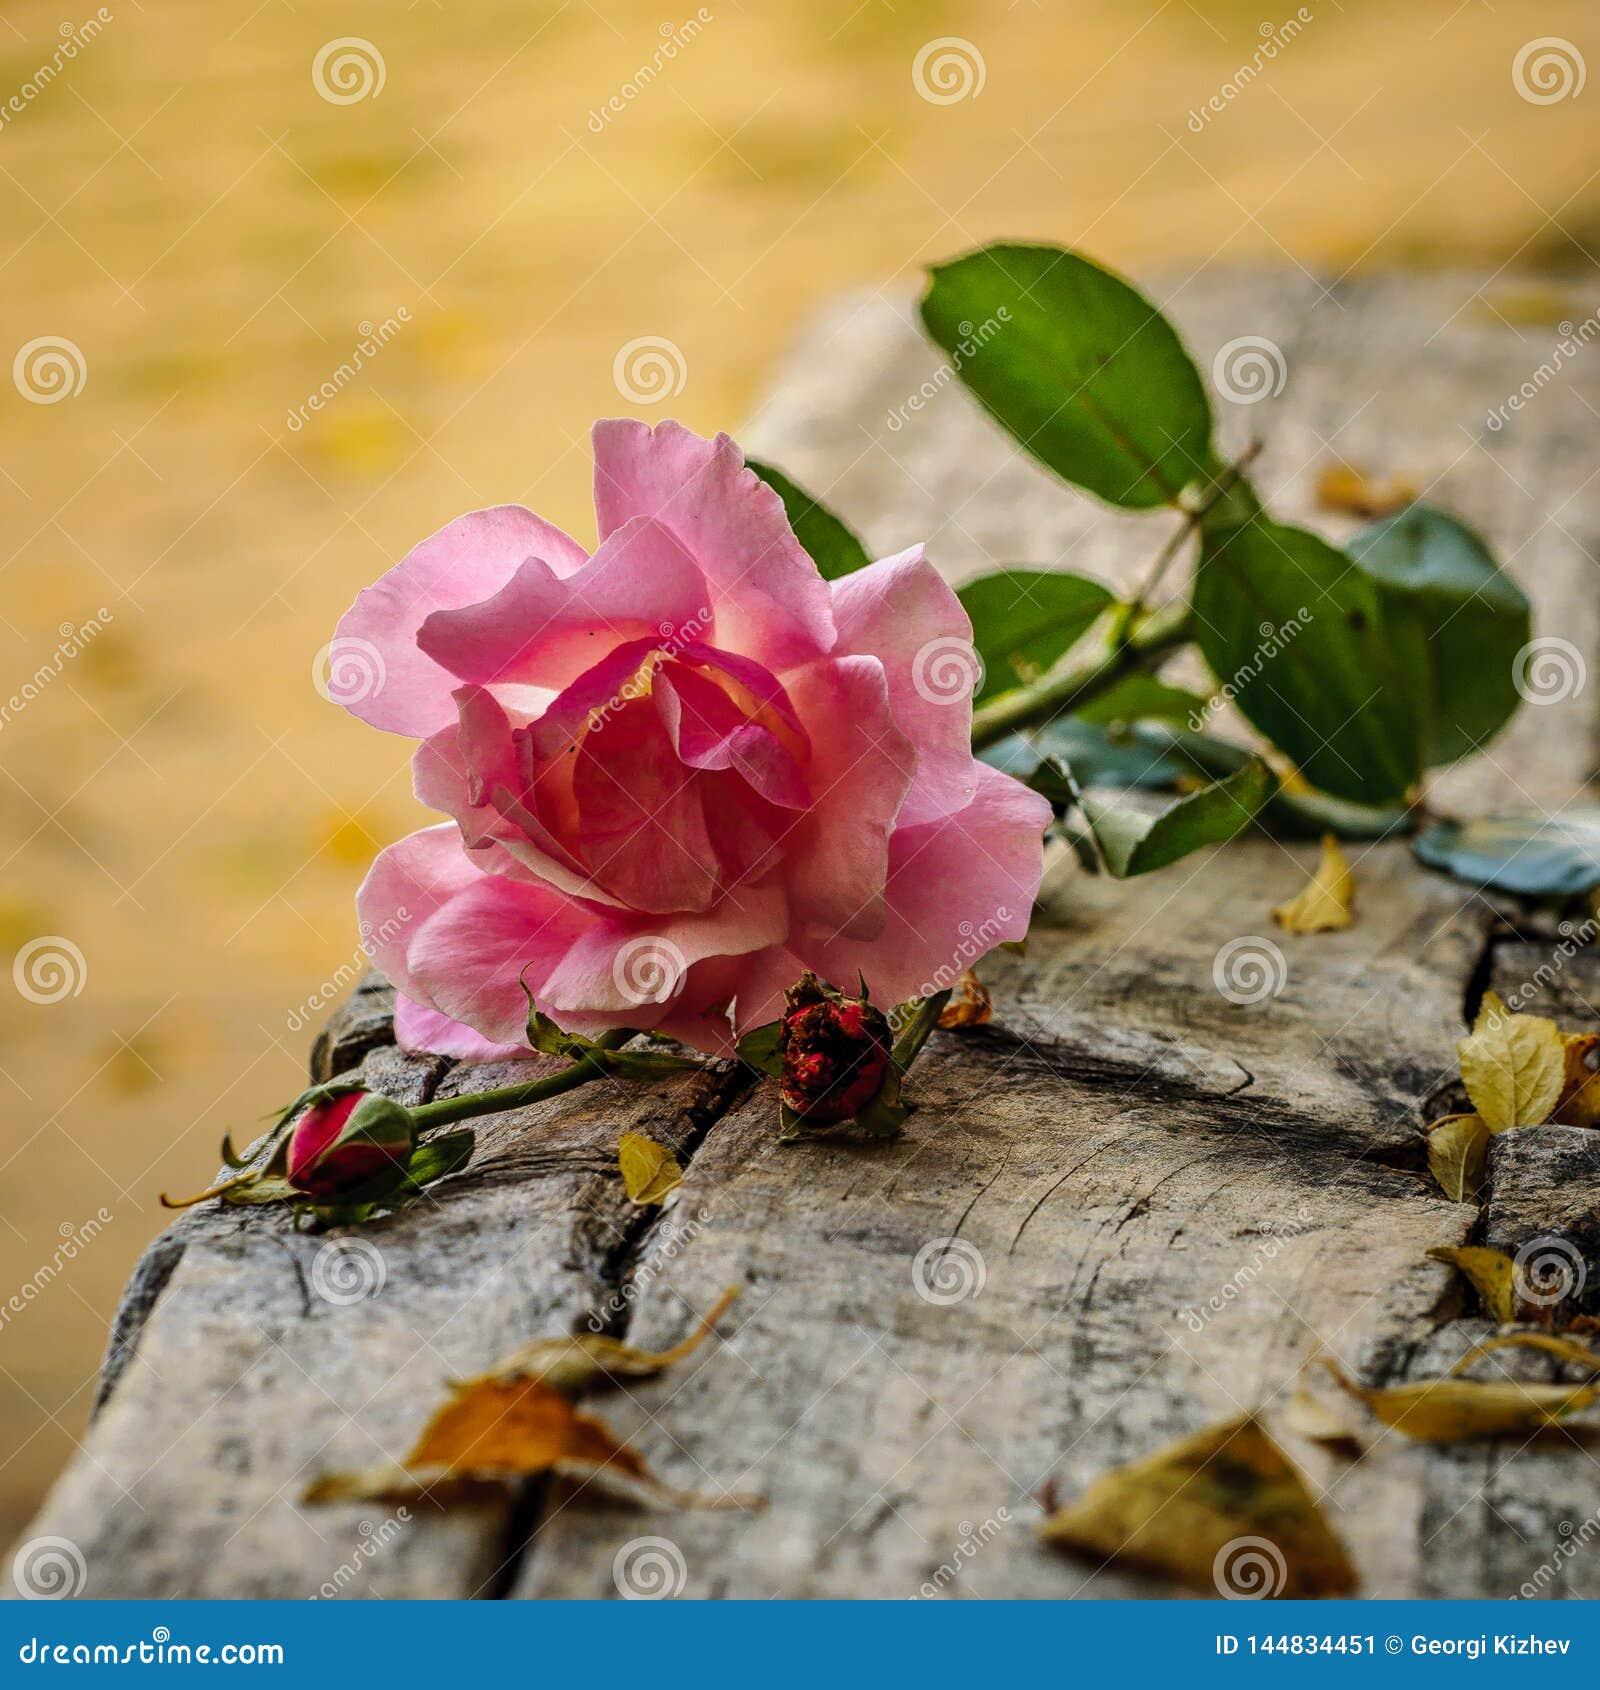 Macro rose with leaf